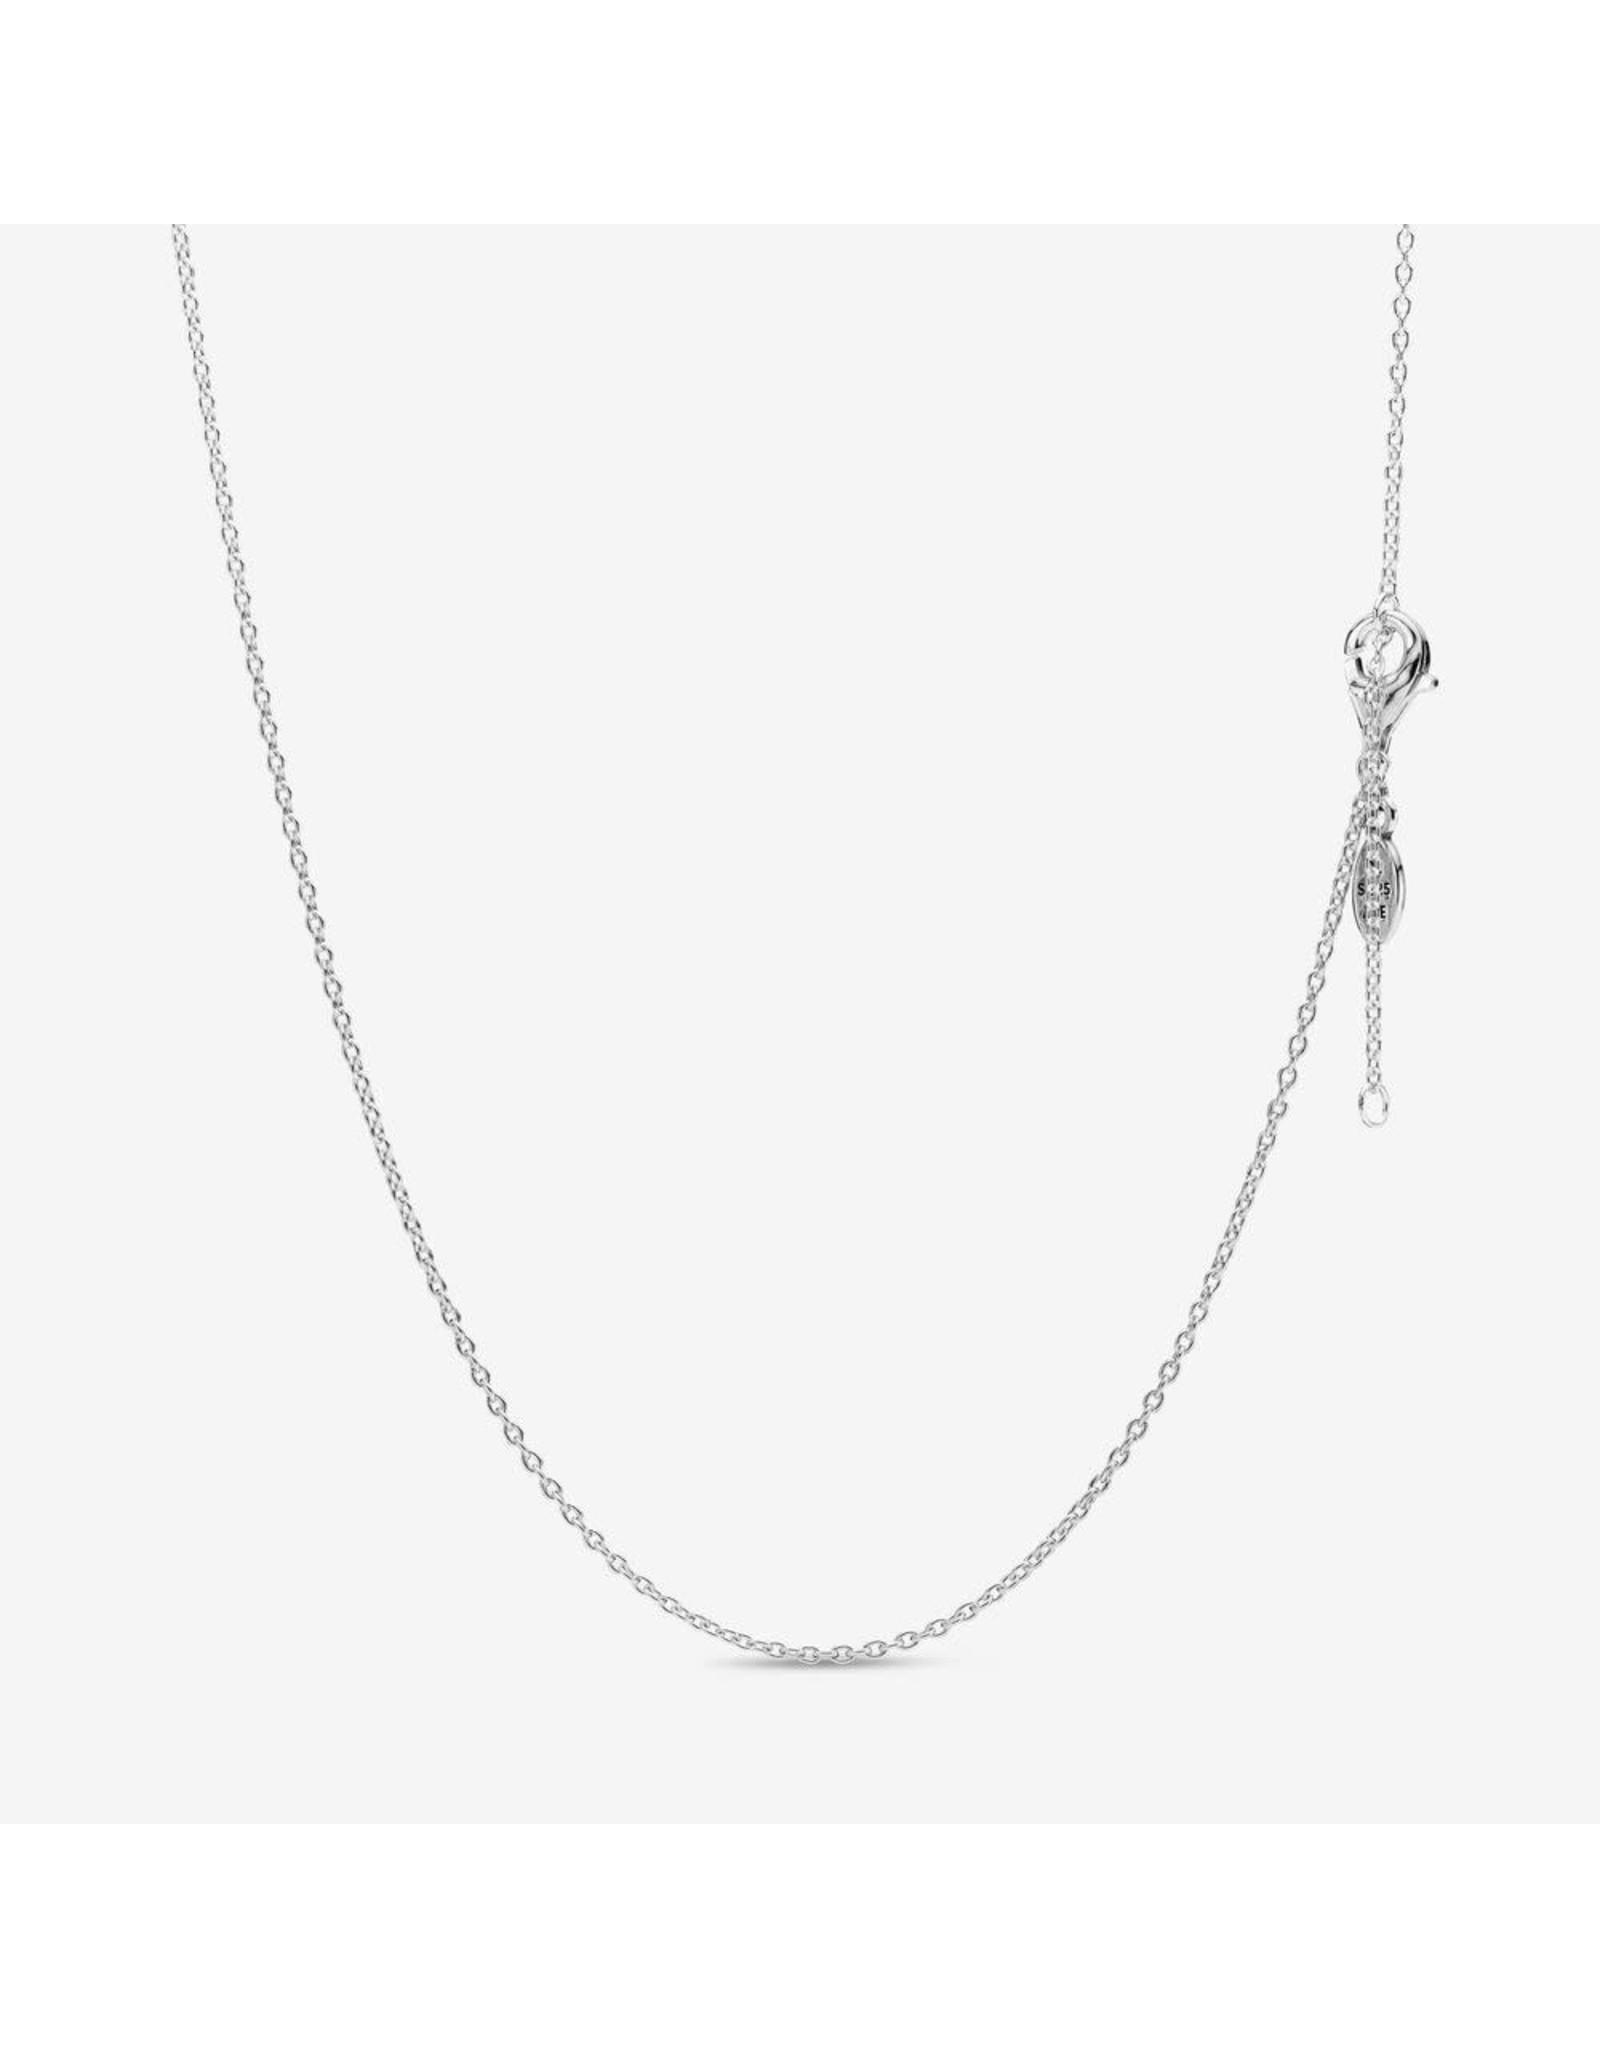 Pandora Pandora (590515-45) Delicate Silver Chain, 45 cm